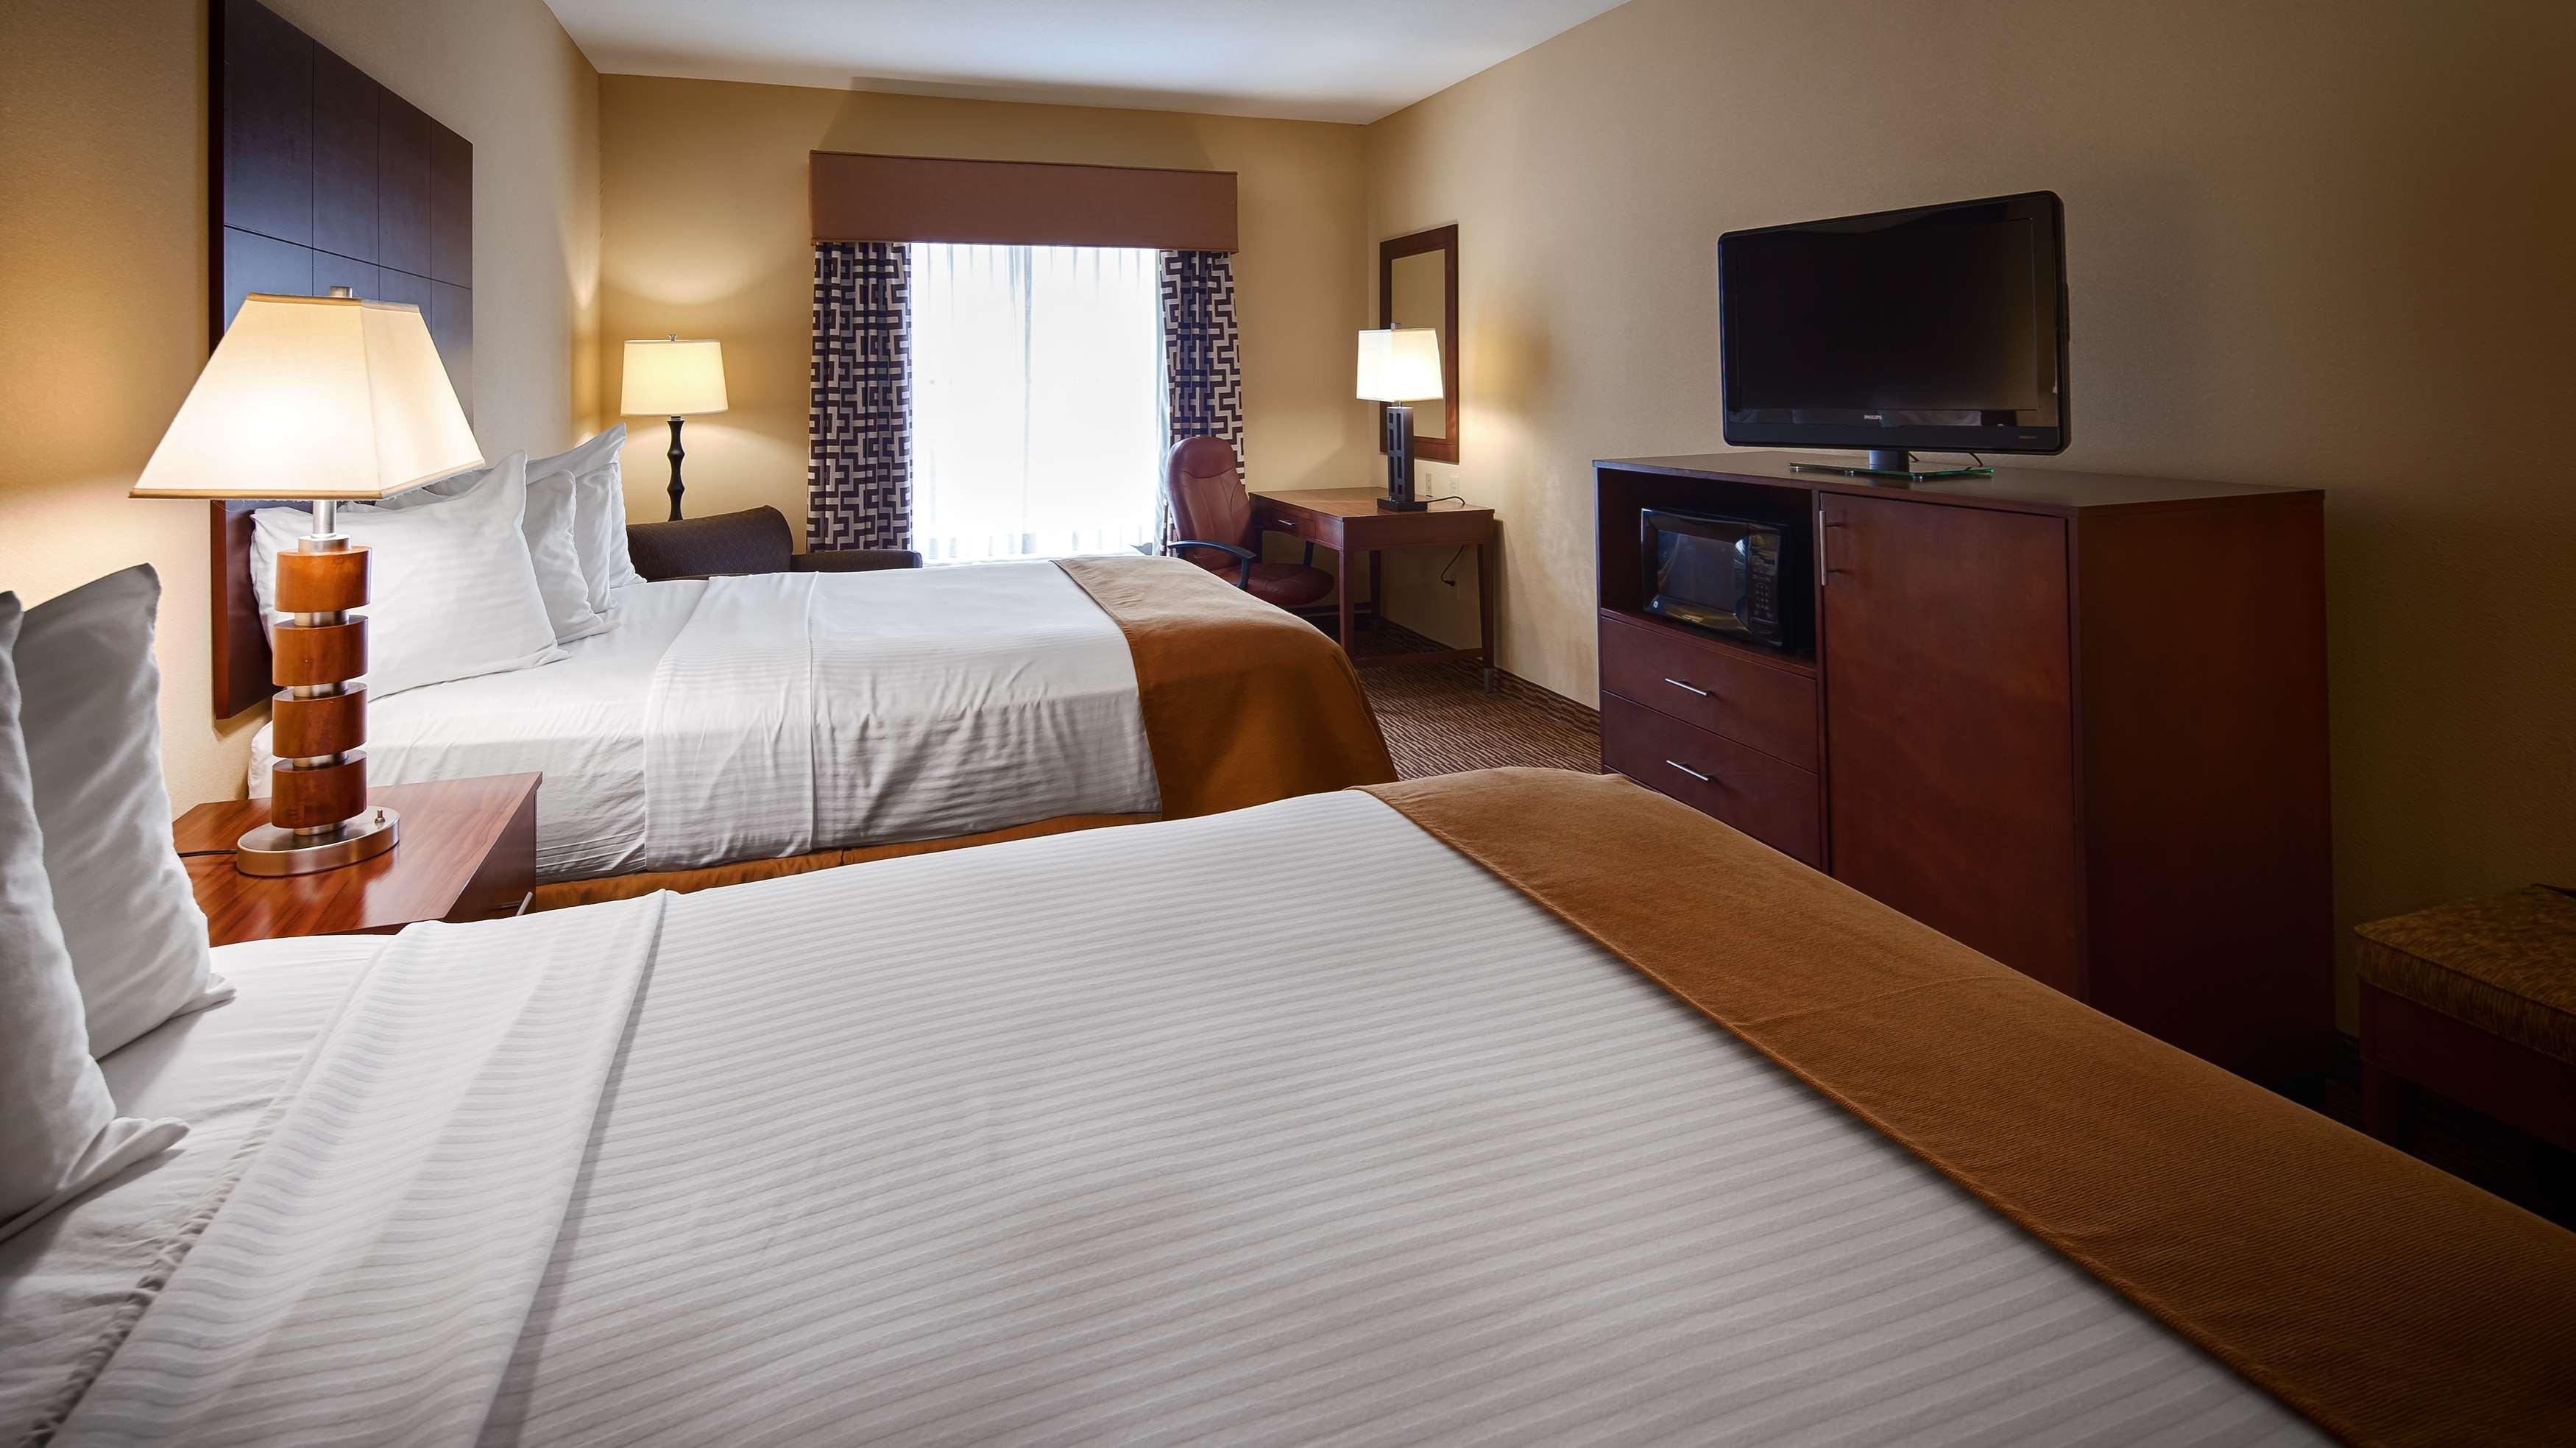 Best Western St. Francisville Hotel image 14